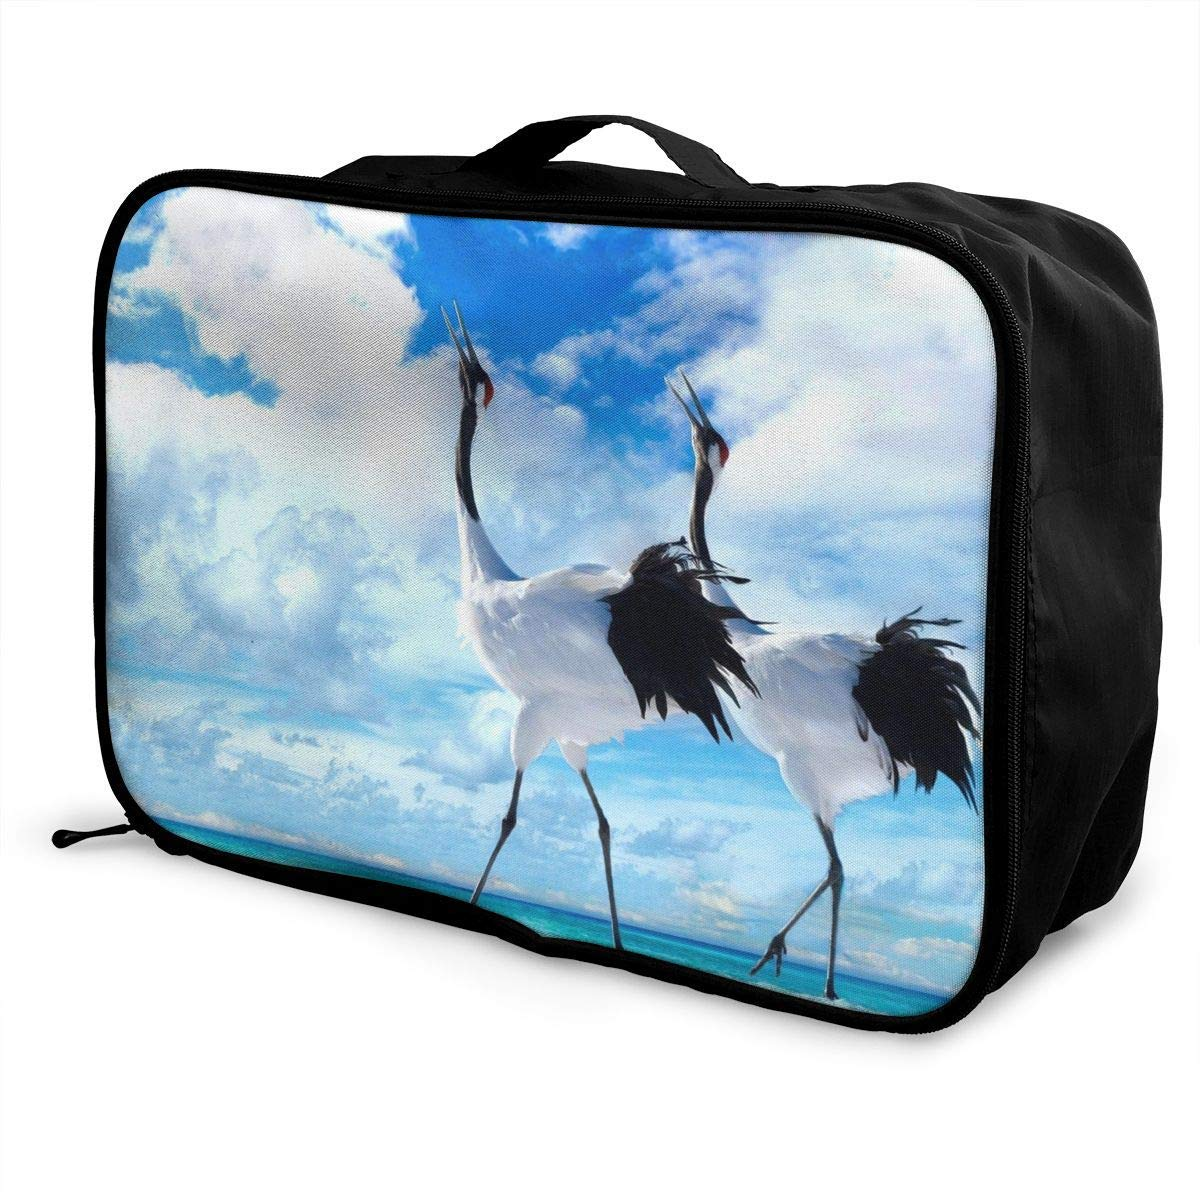 Lightweight Large Capacity Portable Duffel Bag for Men /& Women Wild White Crane Travel Duffel Bag Backpack JTRVW Luggage Bags for Travel